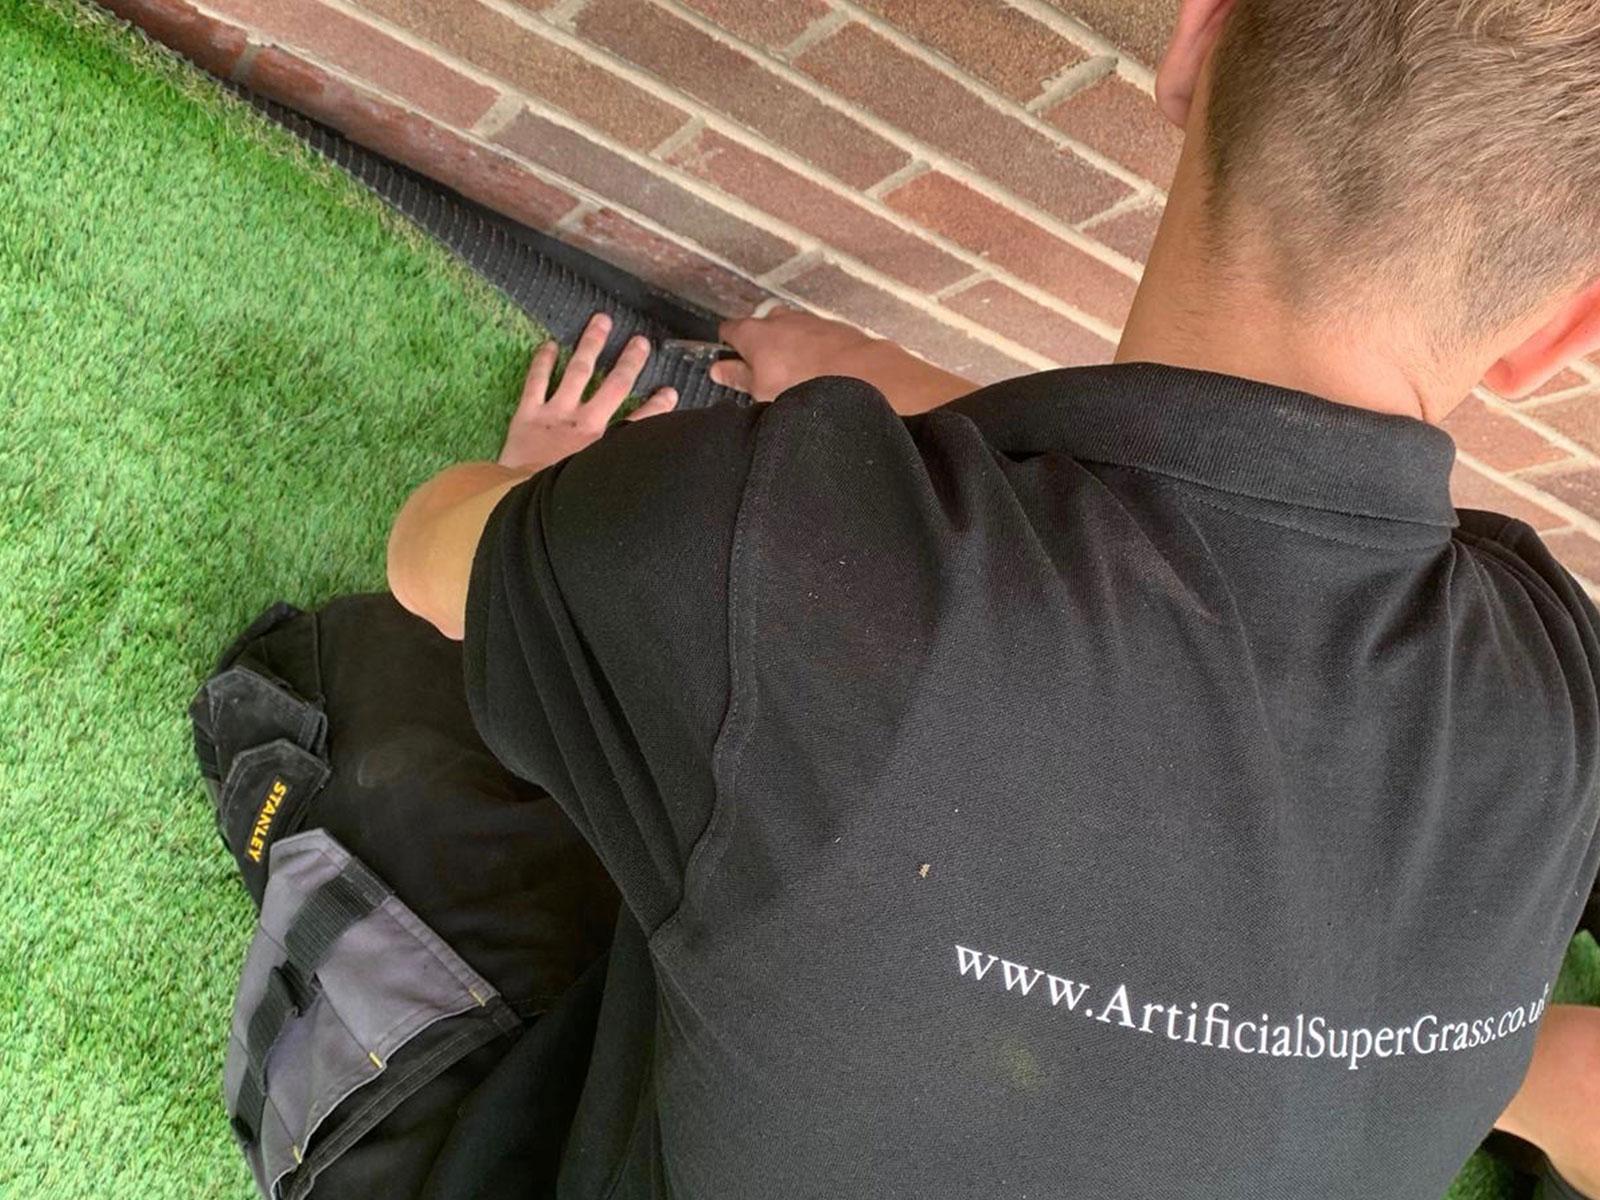 Astro Turf Hinckley Artificial Super Grass